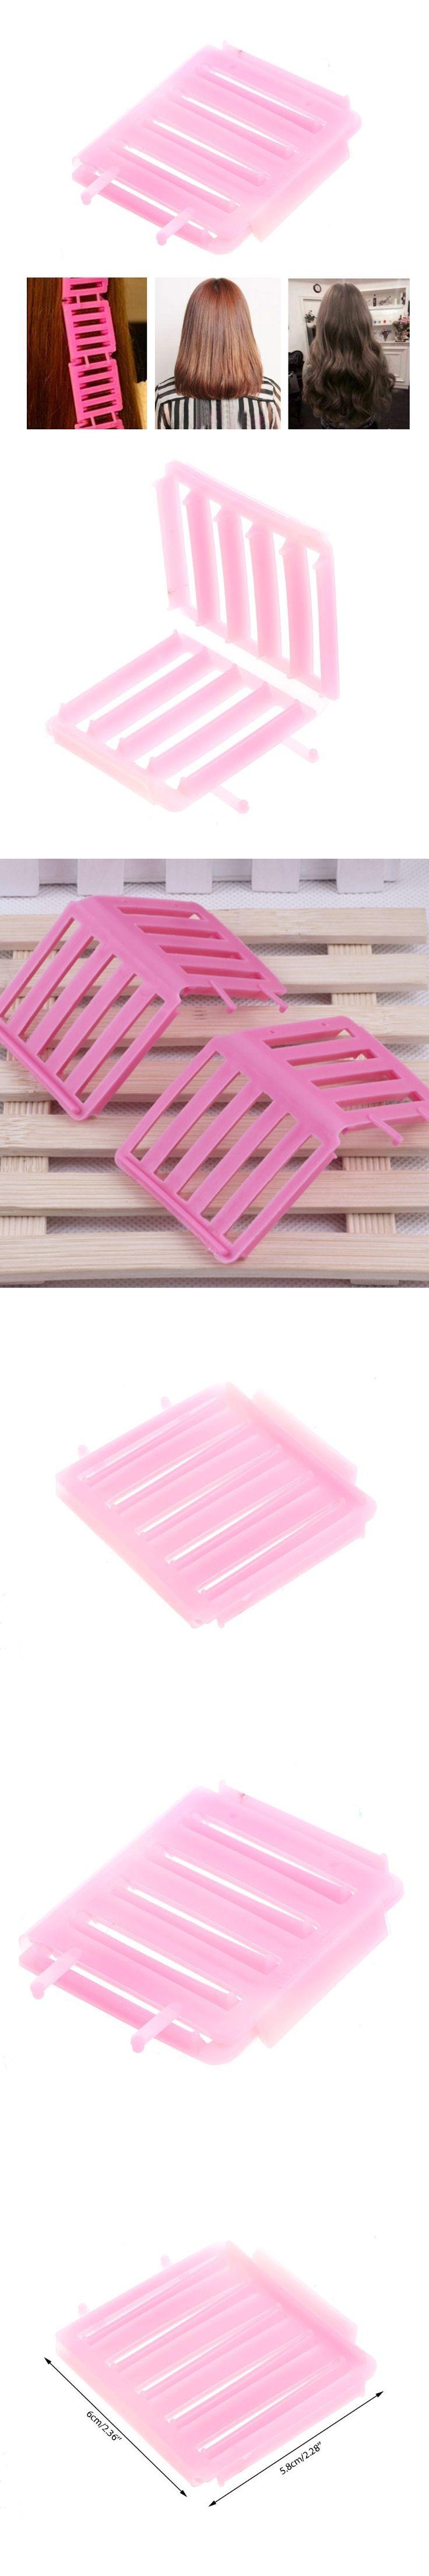 New Fashion Plastic Hair Styling Roller Curler Maker Curler Bendy Twist Curls Tool DIY Girls Women Pink Flexible Hair Curler